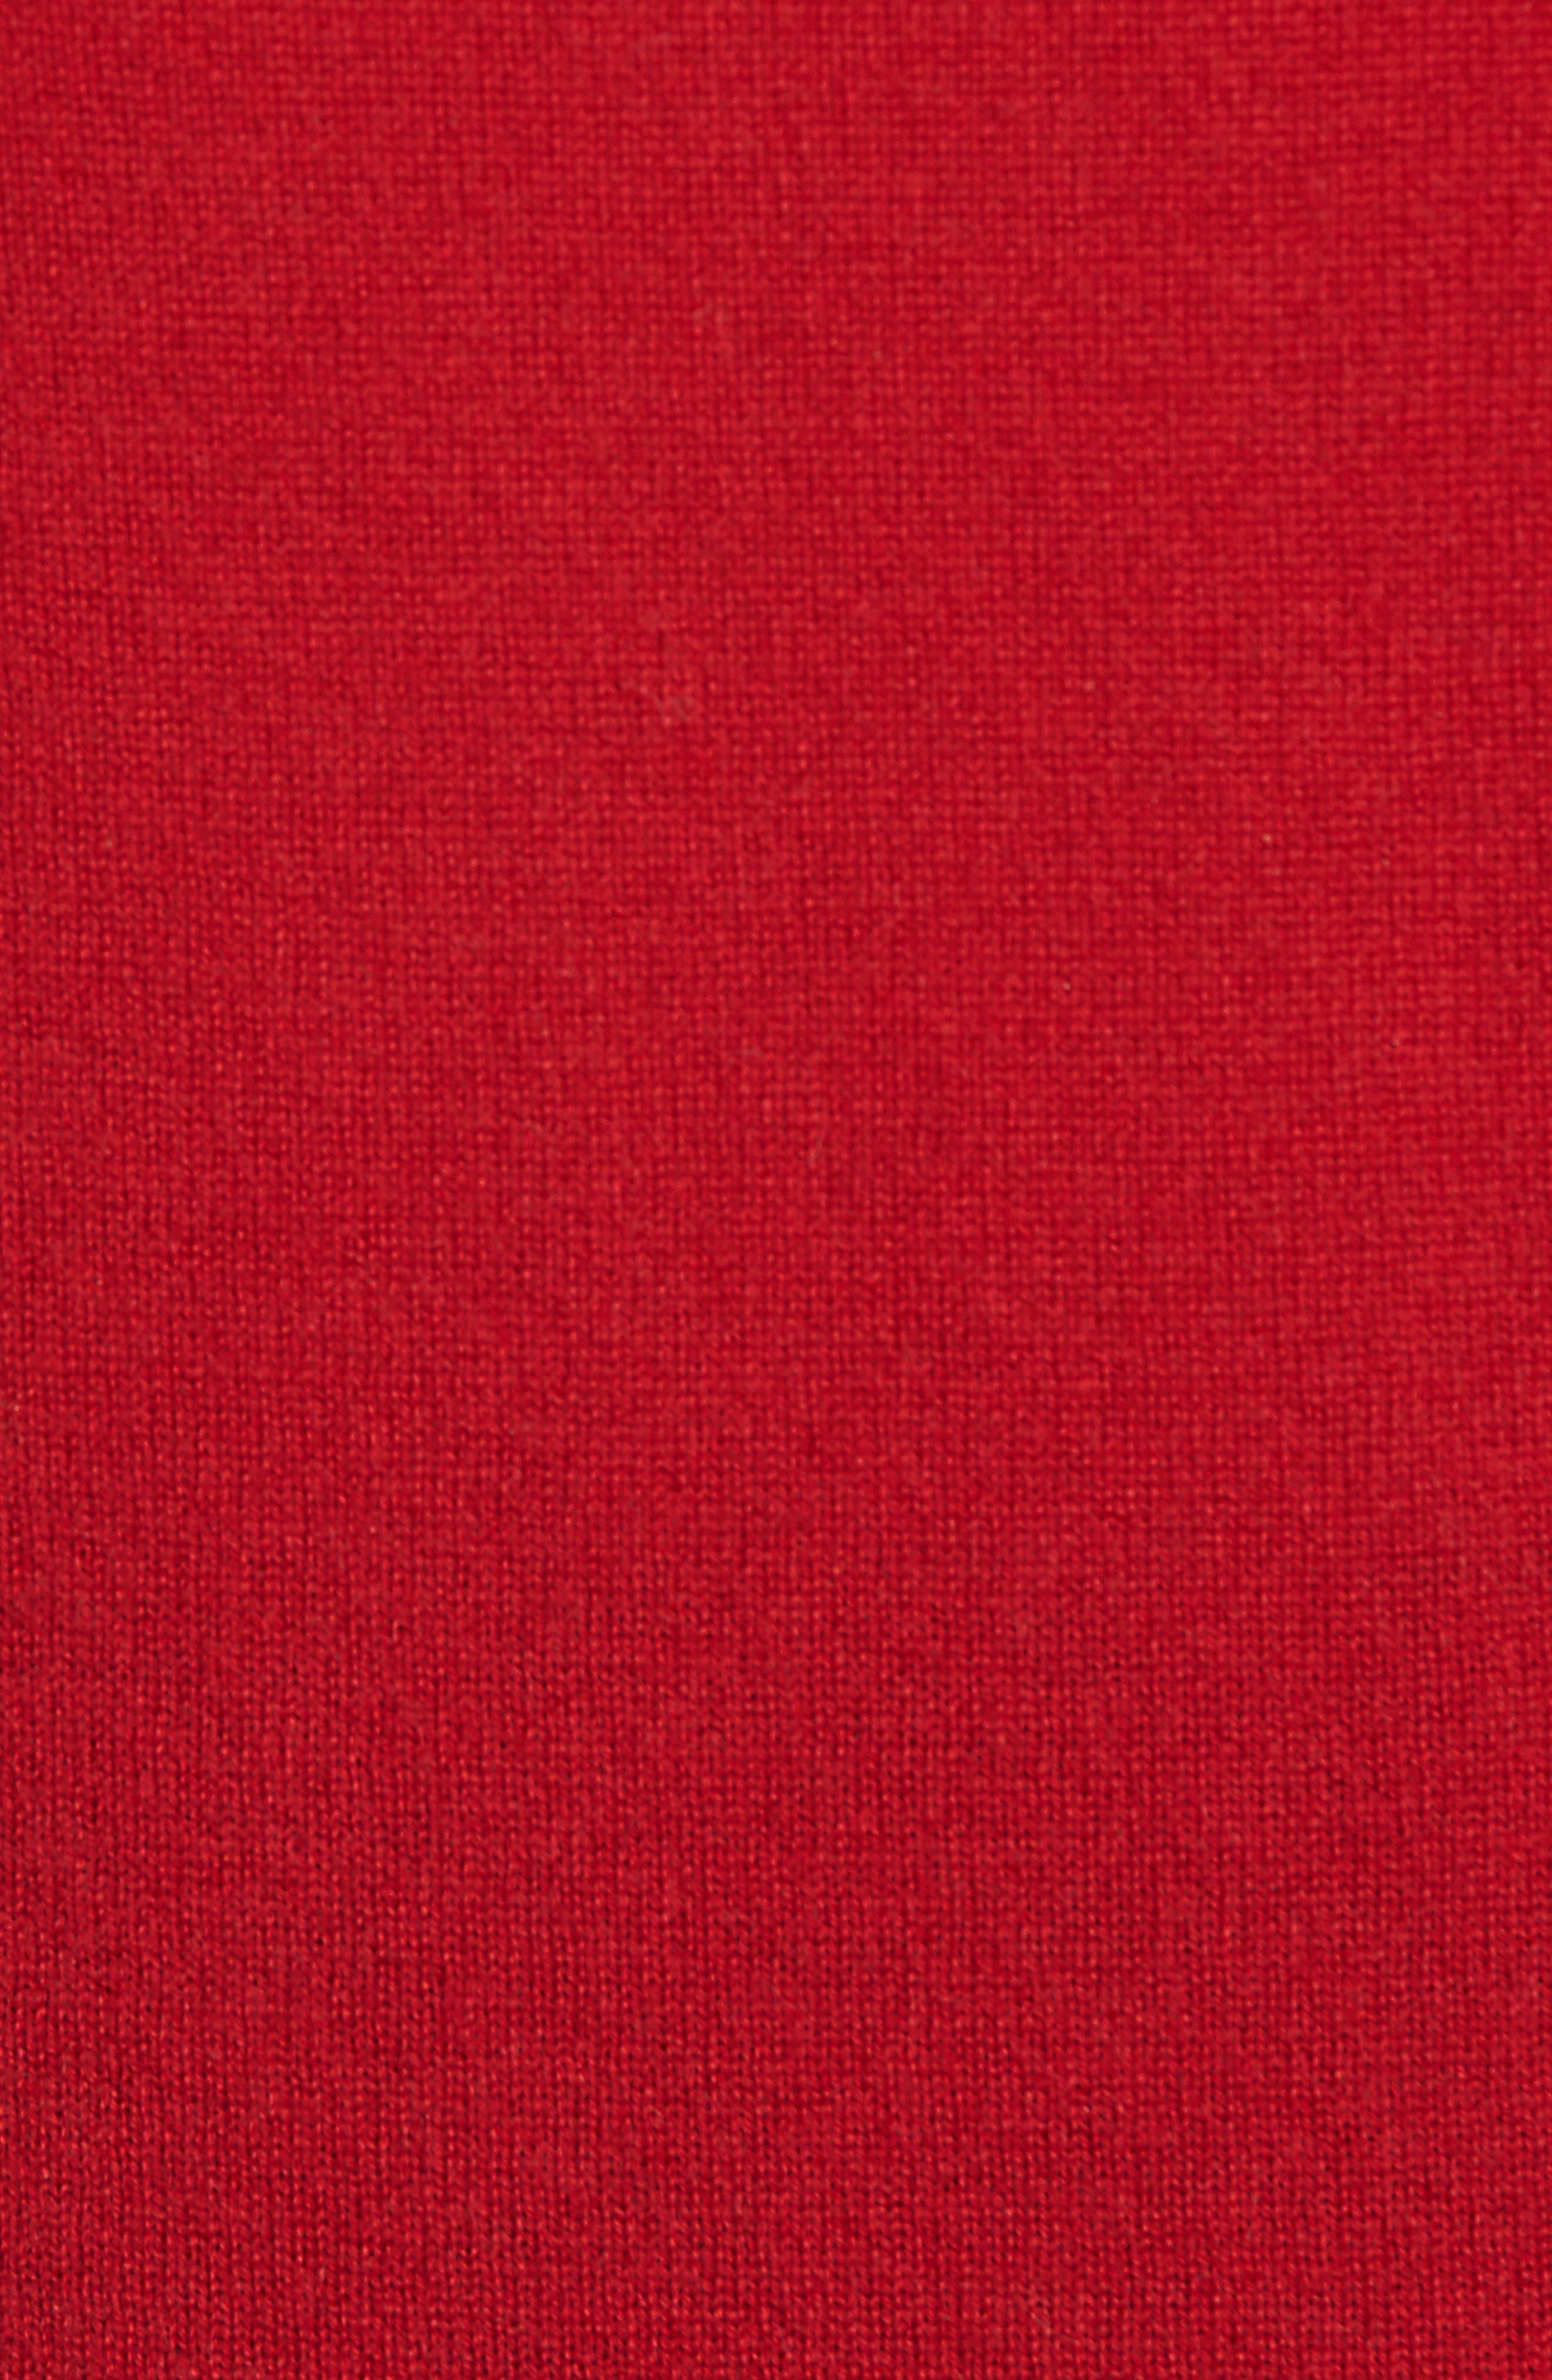 Blouson Sleeve Cashmere Sweater,                             Alternate thumbnail 5, color,                             LIPSTICK